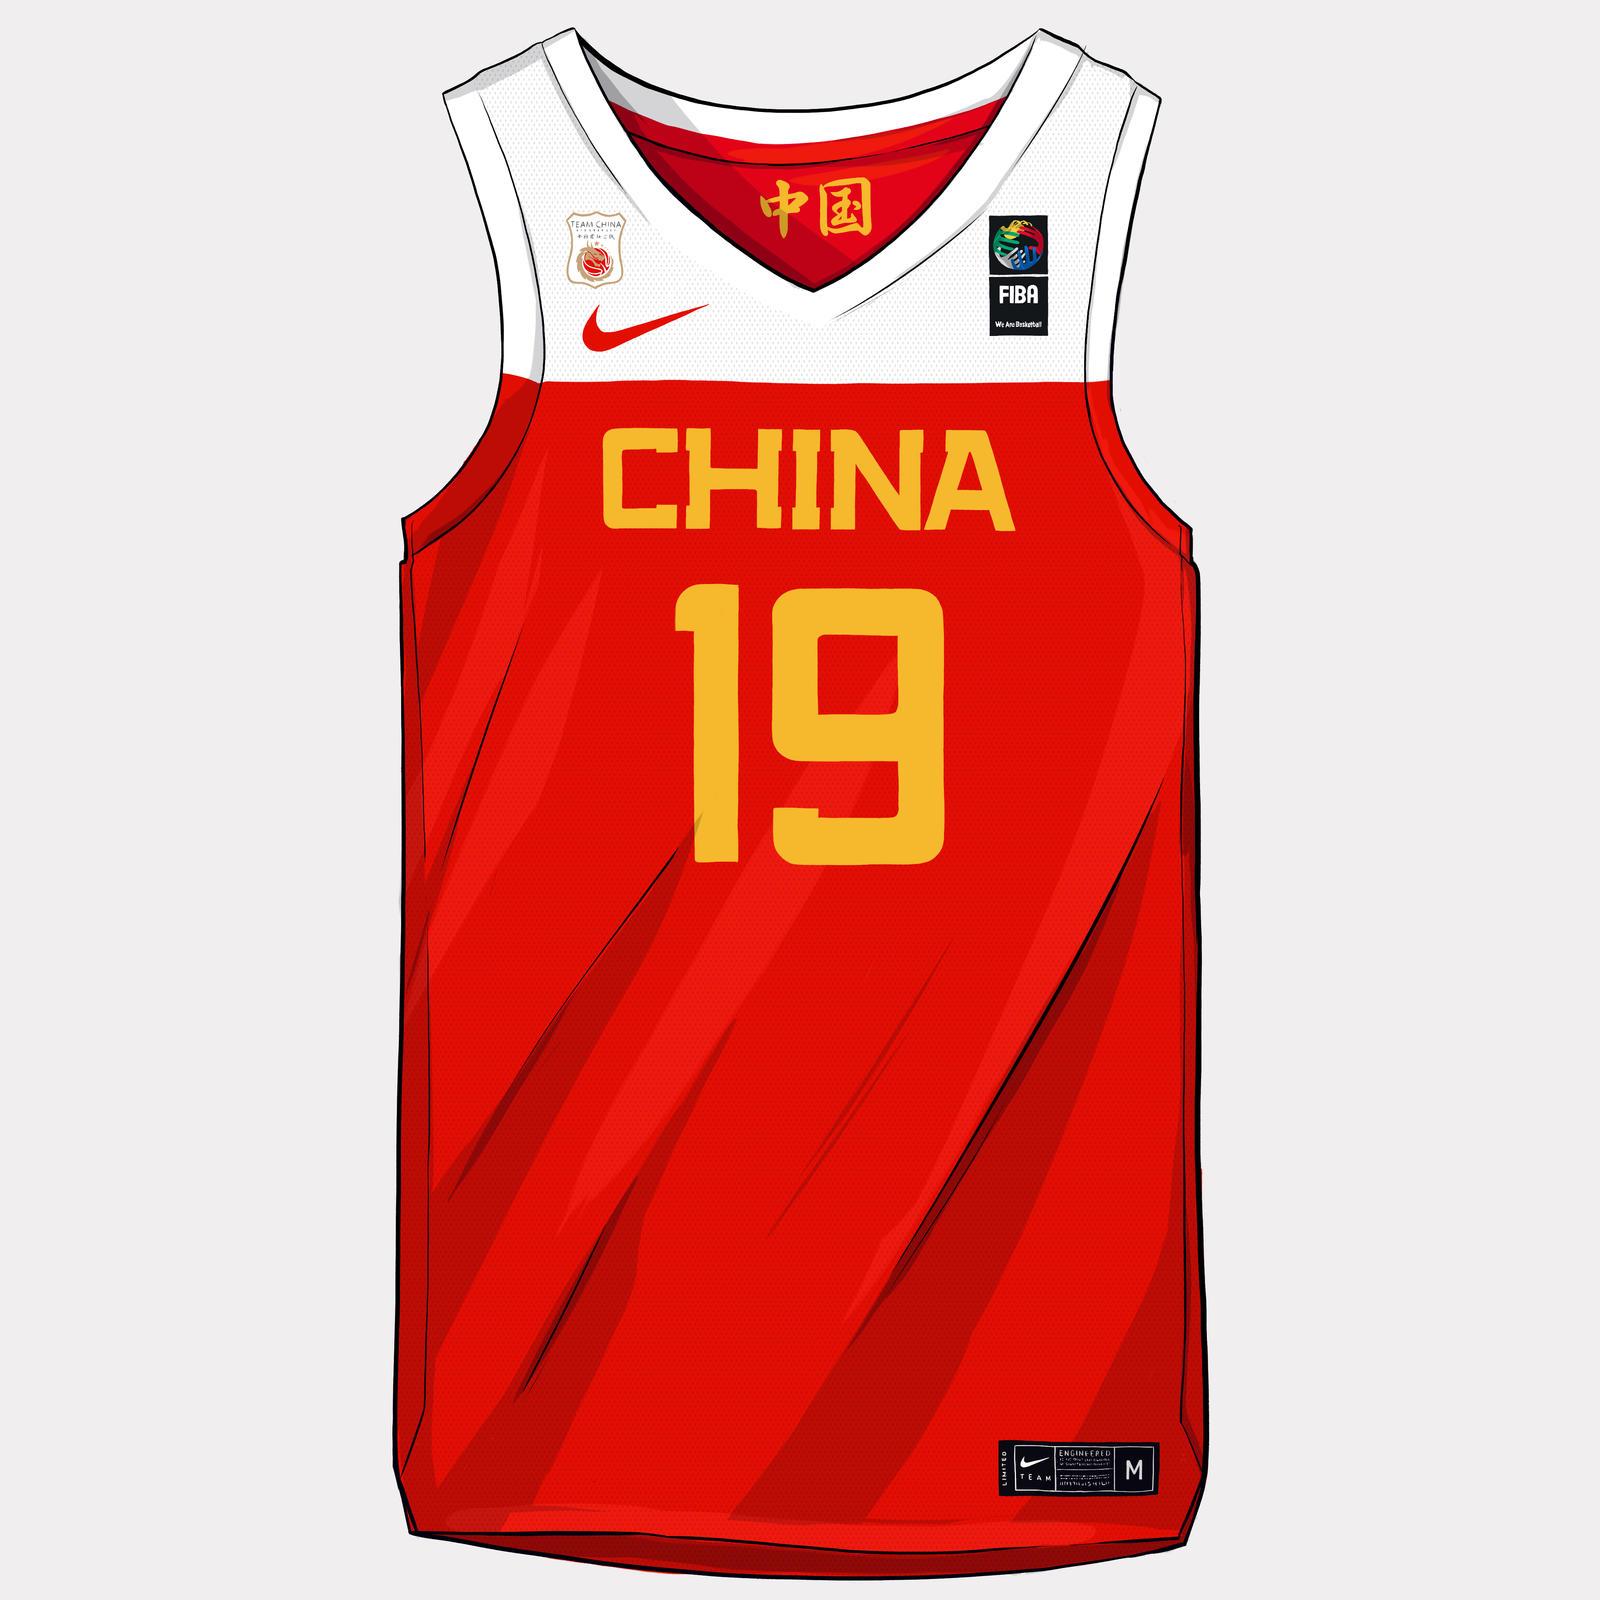 NikeNews_China19BasketballUniforms_chinared1x1v2_89680.jpg